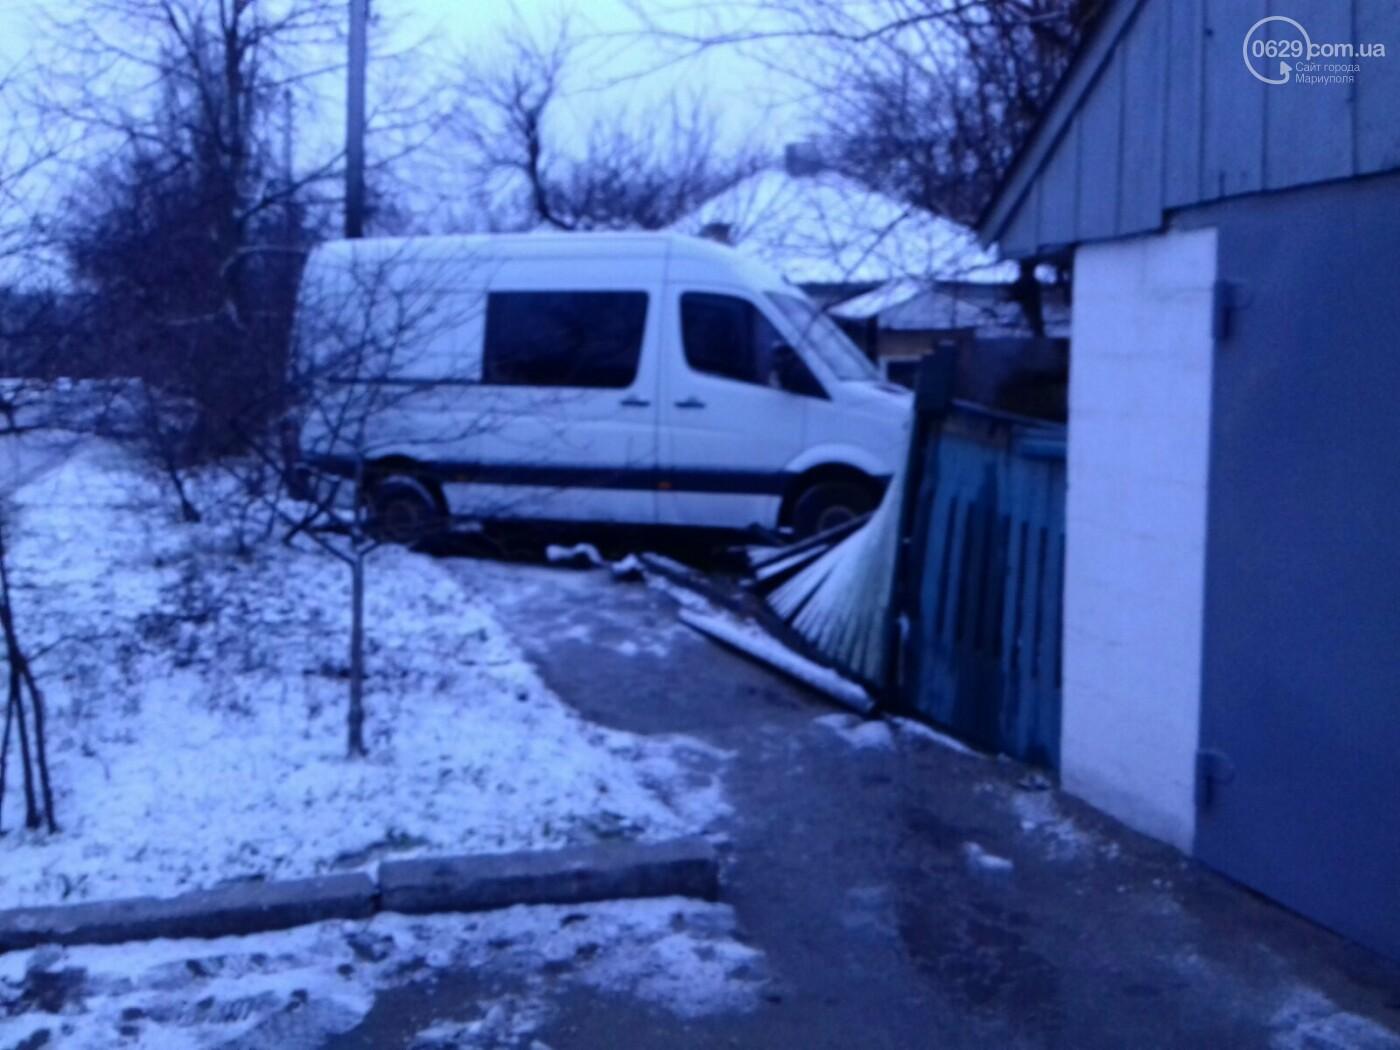 На Левобережье Мариуполя микроавтобус врезался в забор жилого дома, - ФОТО, фото-6